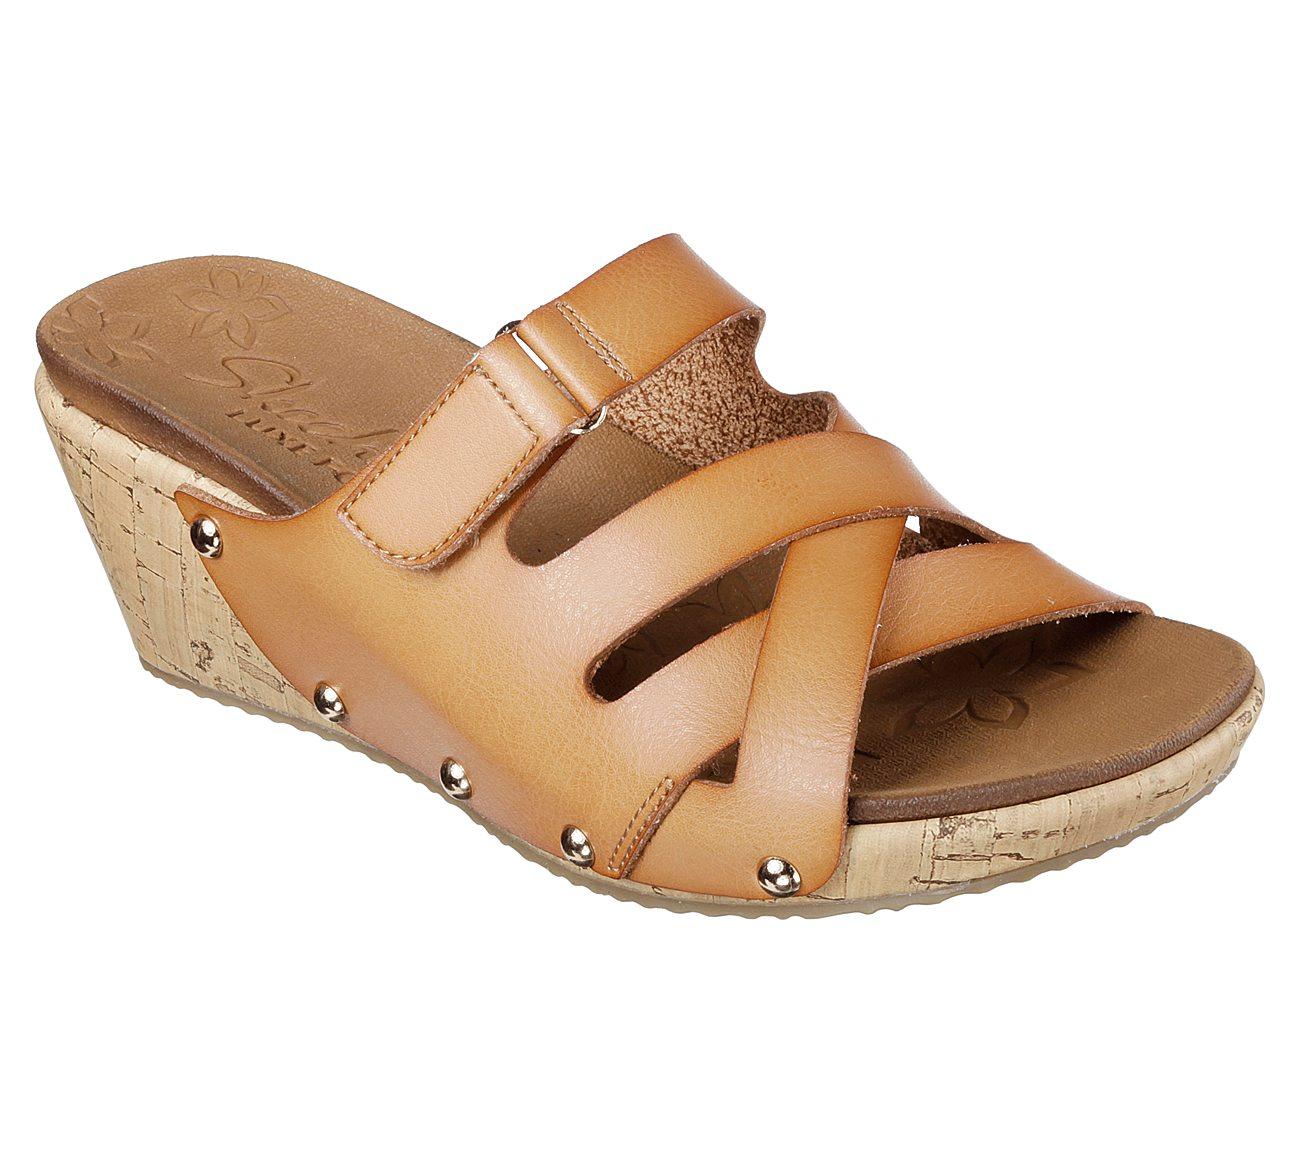 a58eae65ee4f Buy SKECHERS Beverlee - D Luxe Slide Sandals Shoes only  55.00